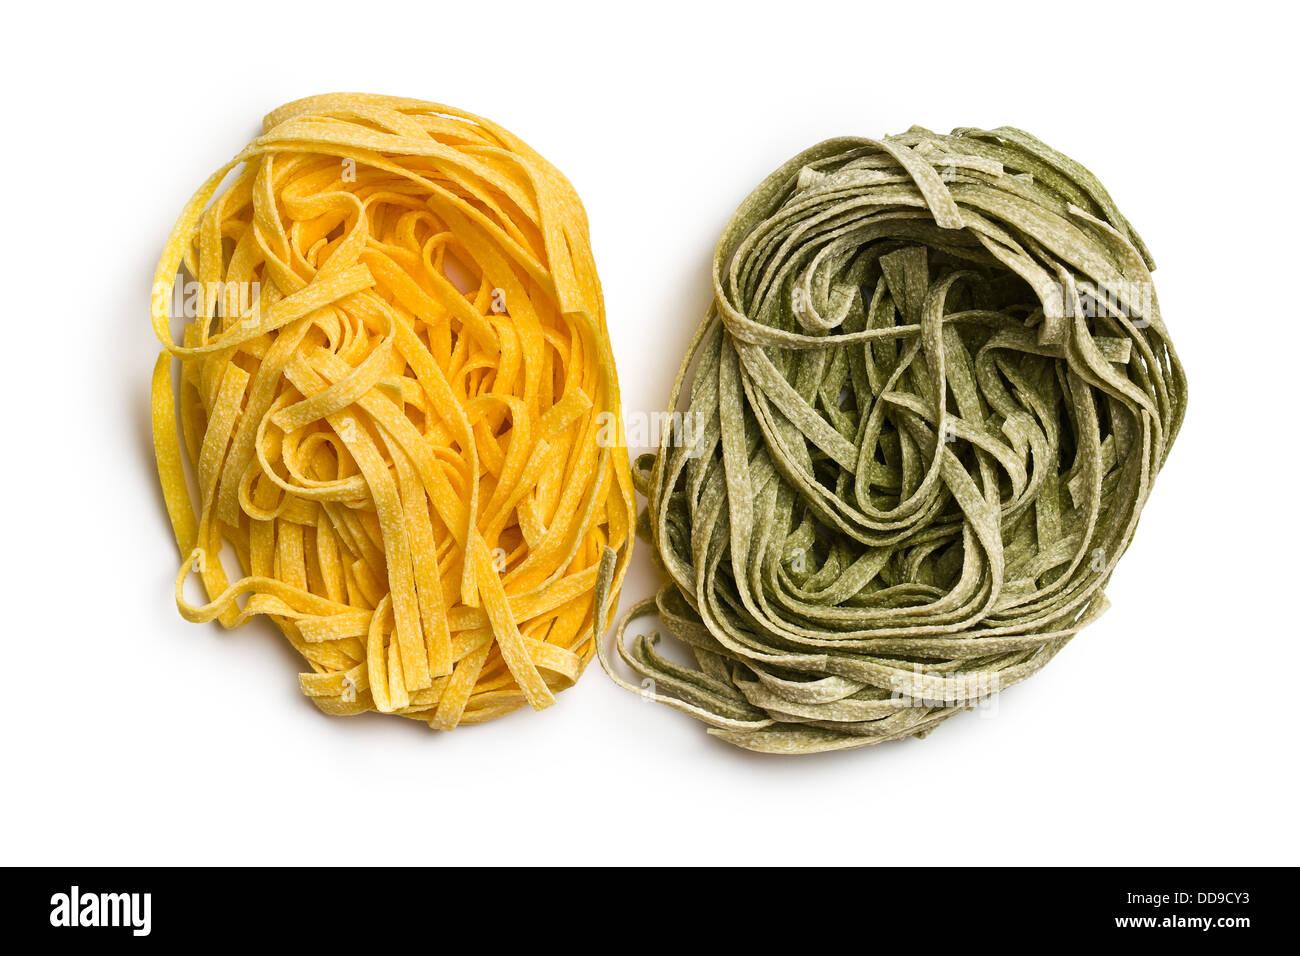 Italian pasta tagliatelle on white background - Stock Image